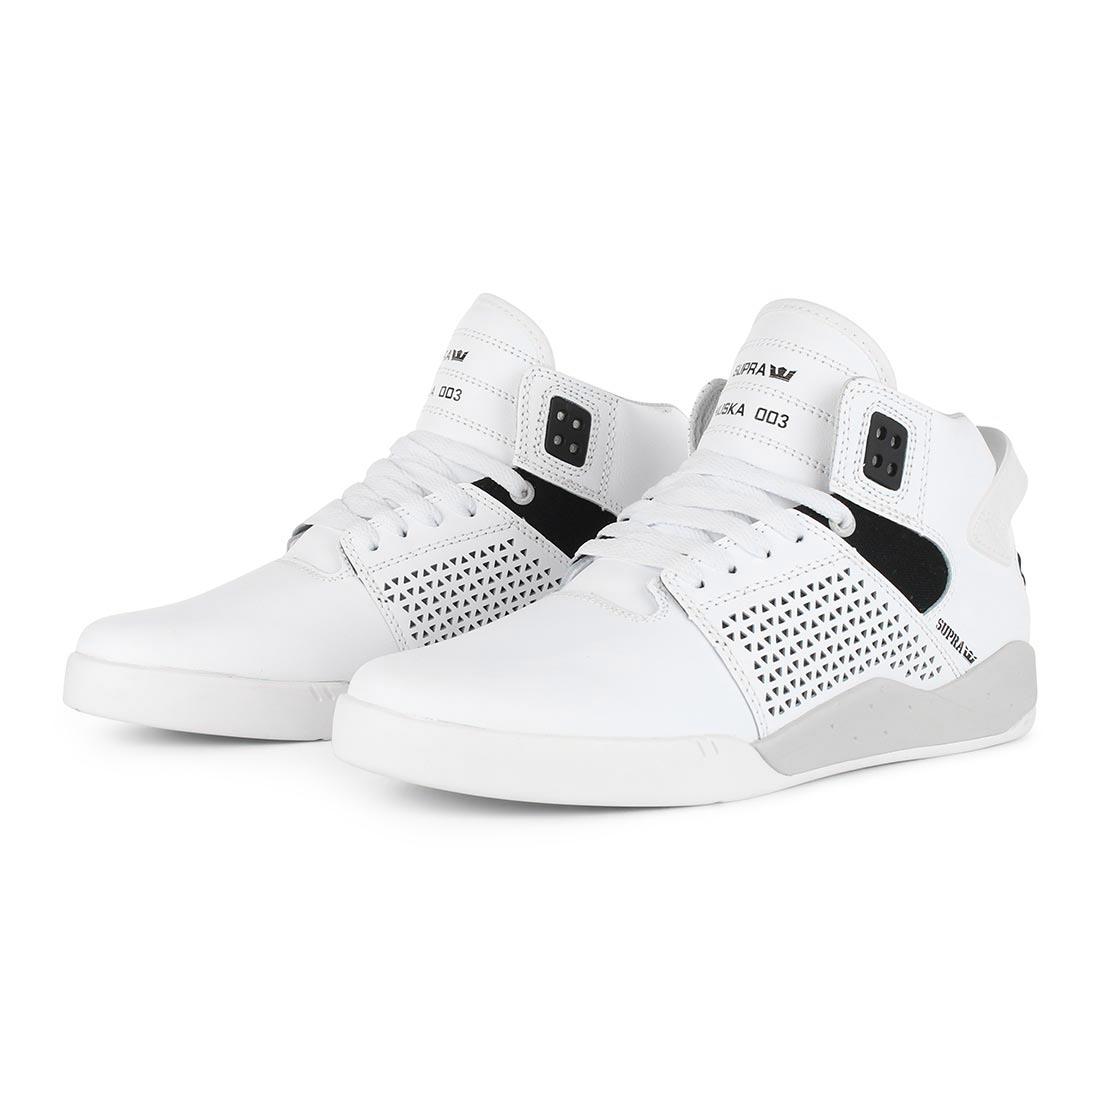 dc9adf5b05c7 Supra Shoes Skytop 3 High Top - White Black White